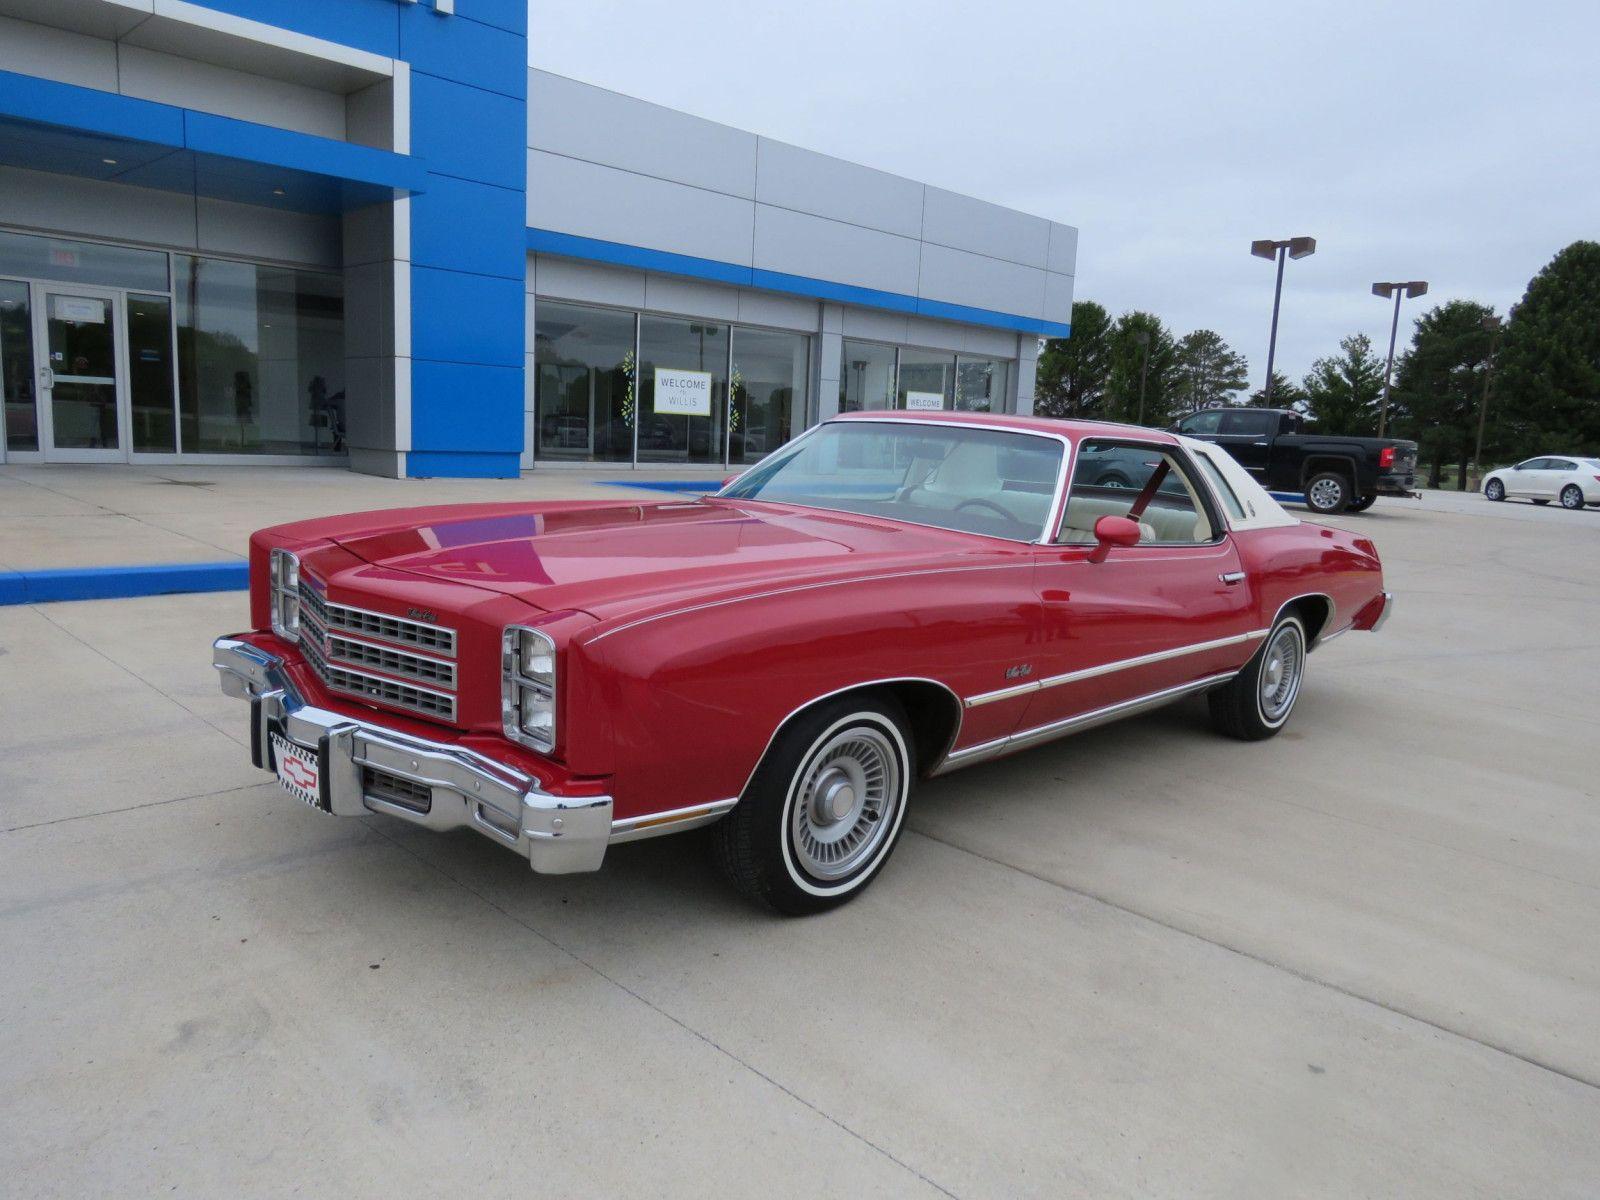 "<img src=""Don-1974-monte-carlo.jpg"" alt=""1974 Chevrolet Chevelle Laguna S-3 Landau Coupe"">"